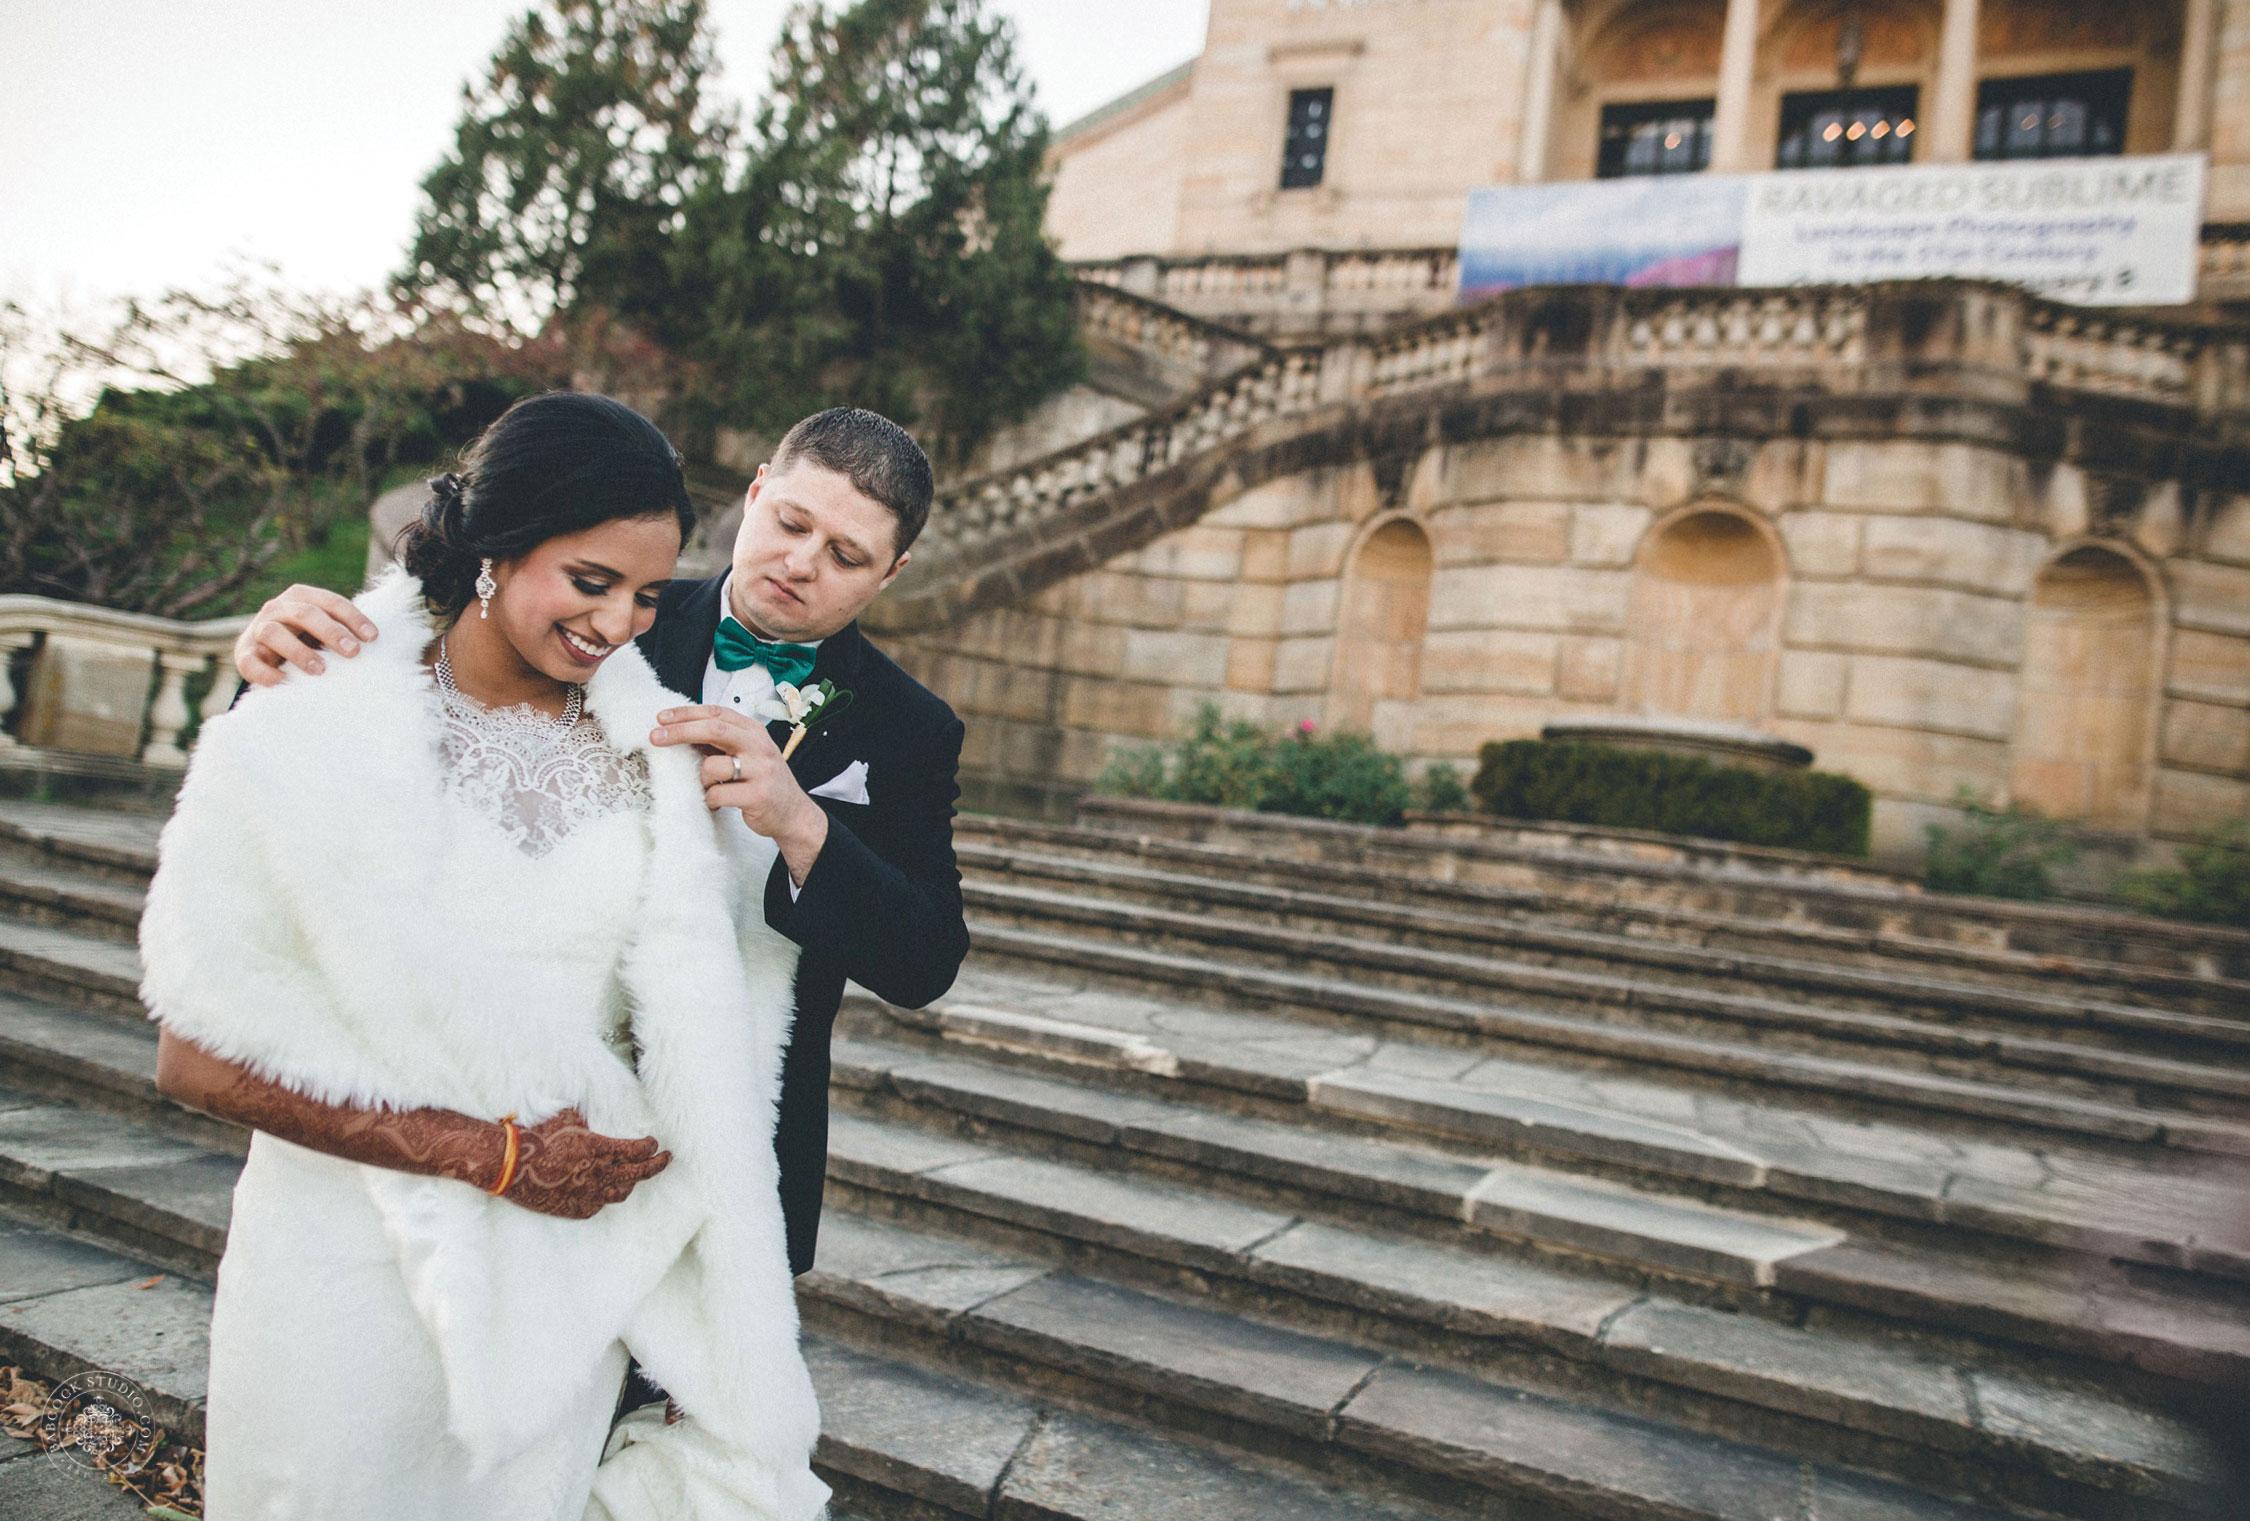 mayuri-brent-indian-wedding-photographer-dayton-ohio-36.jpg